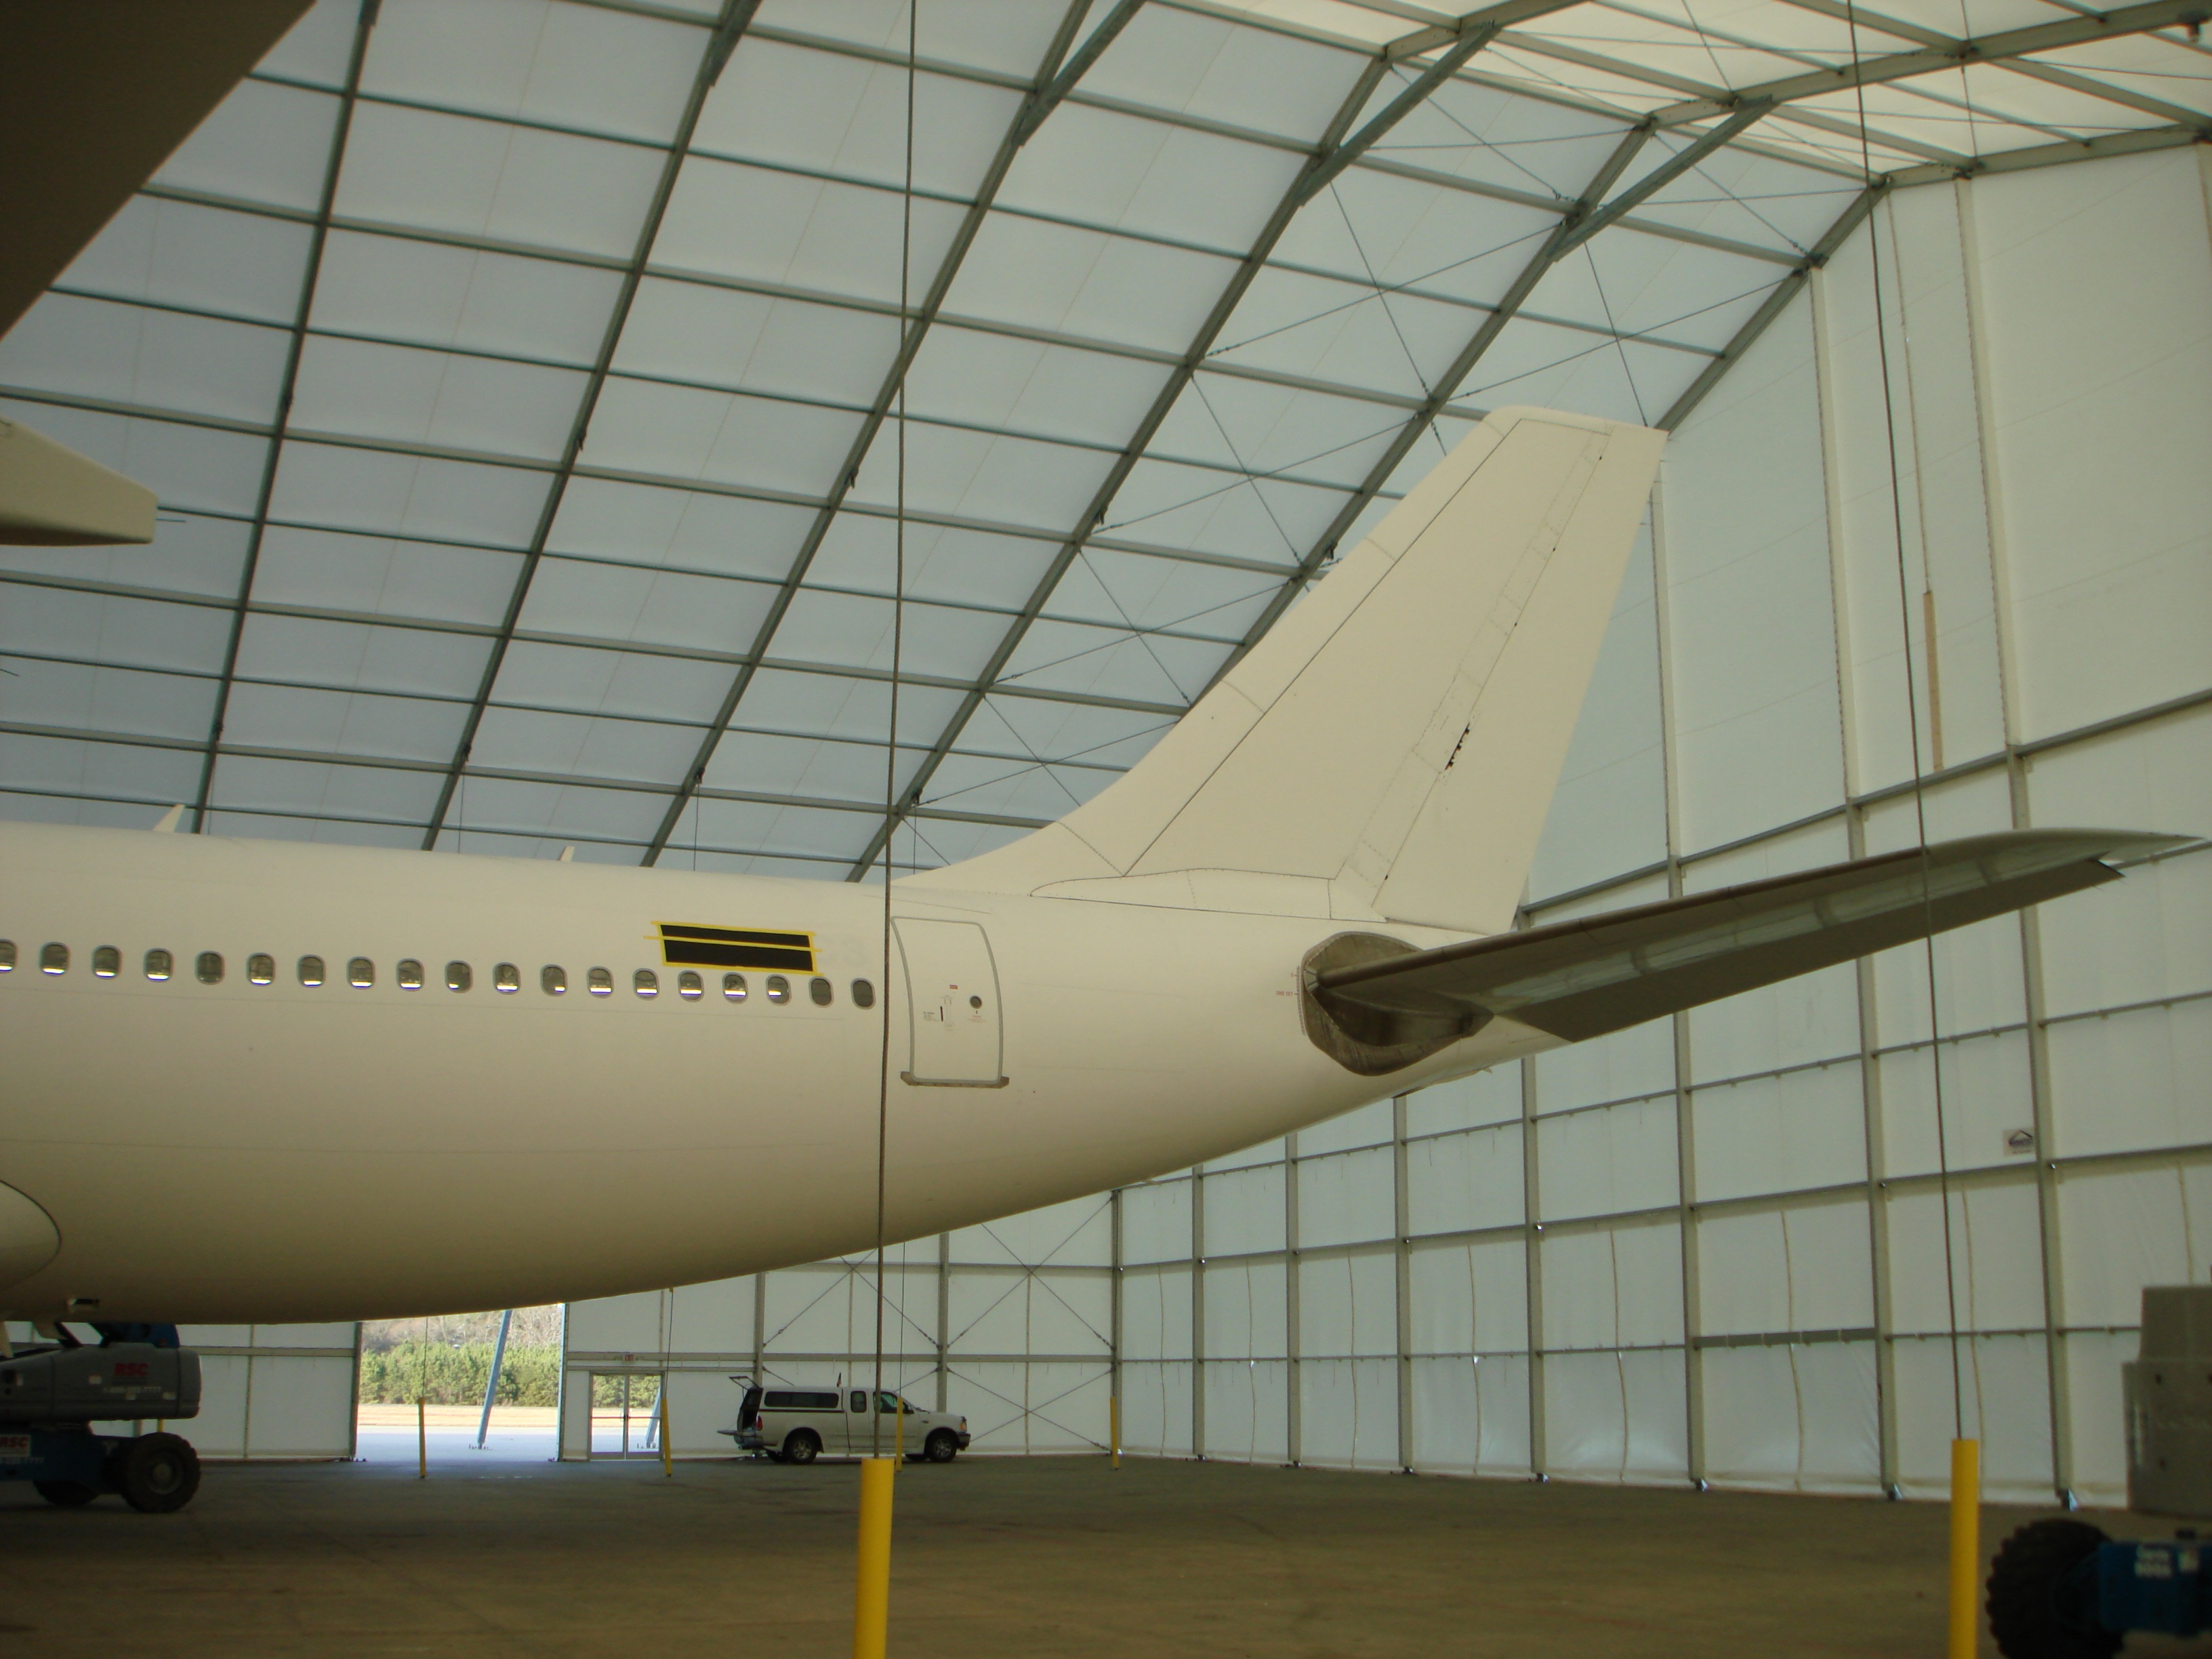 BaySys-028-Megastructure™-Interior-Jet-Side